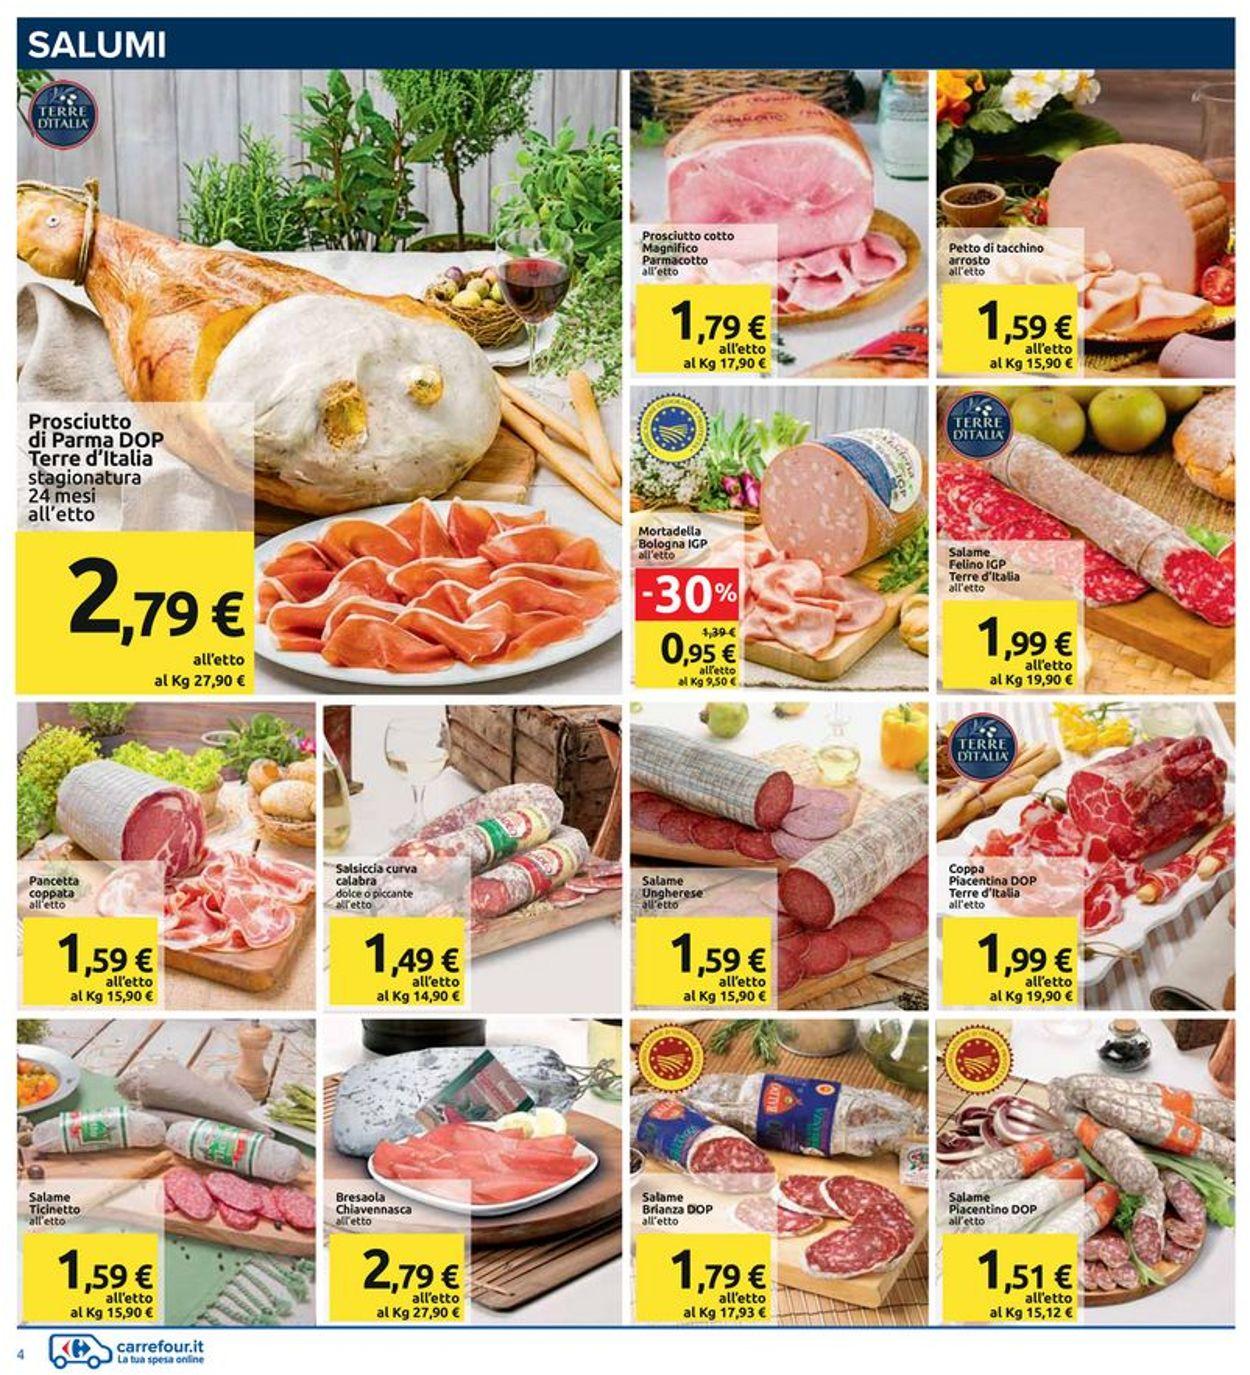 Volantino Carrefour - Offerte 04/05-14/05/2020 (Pagina 4)